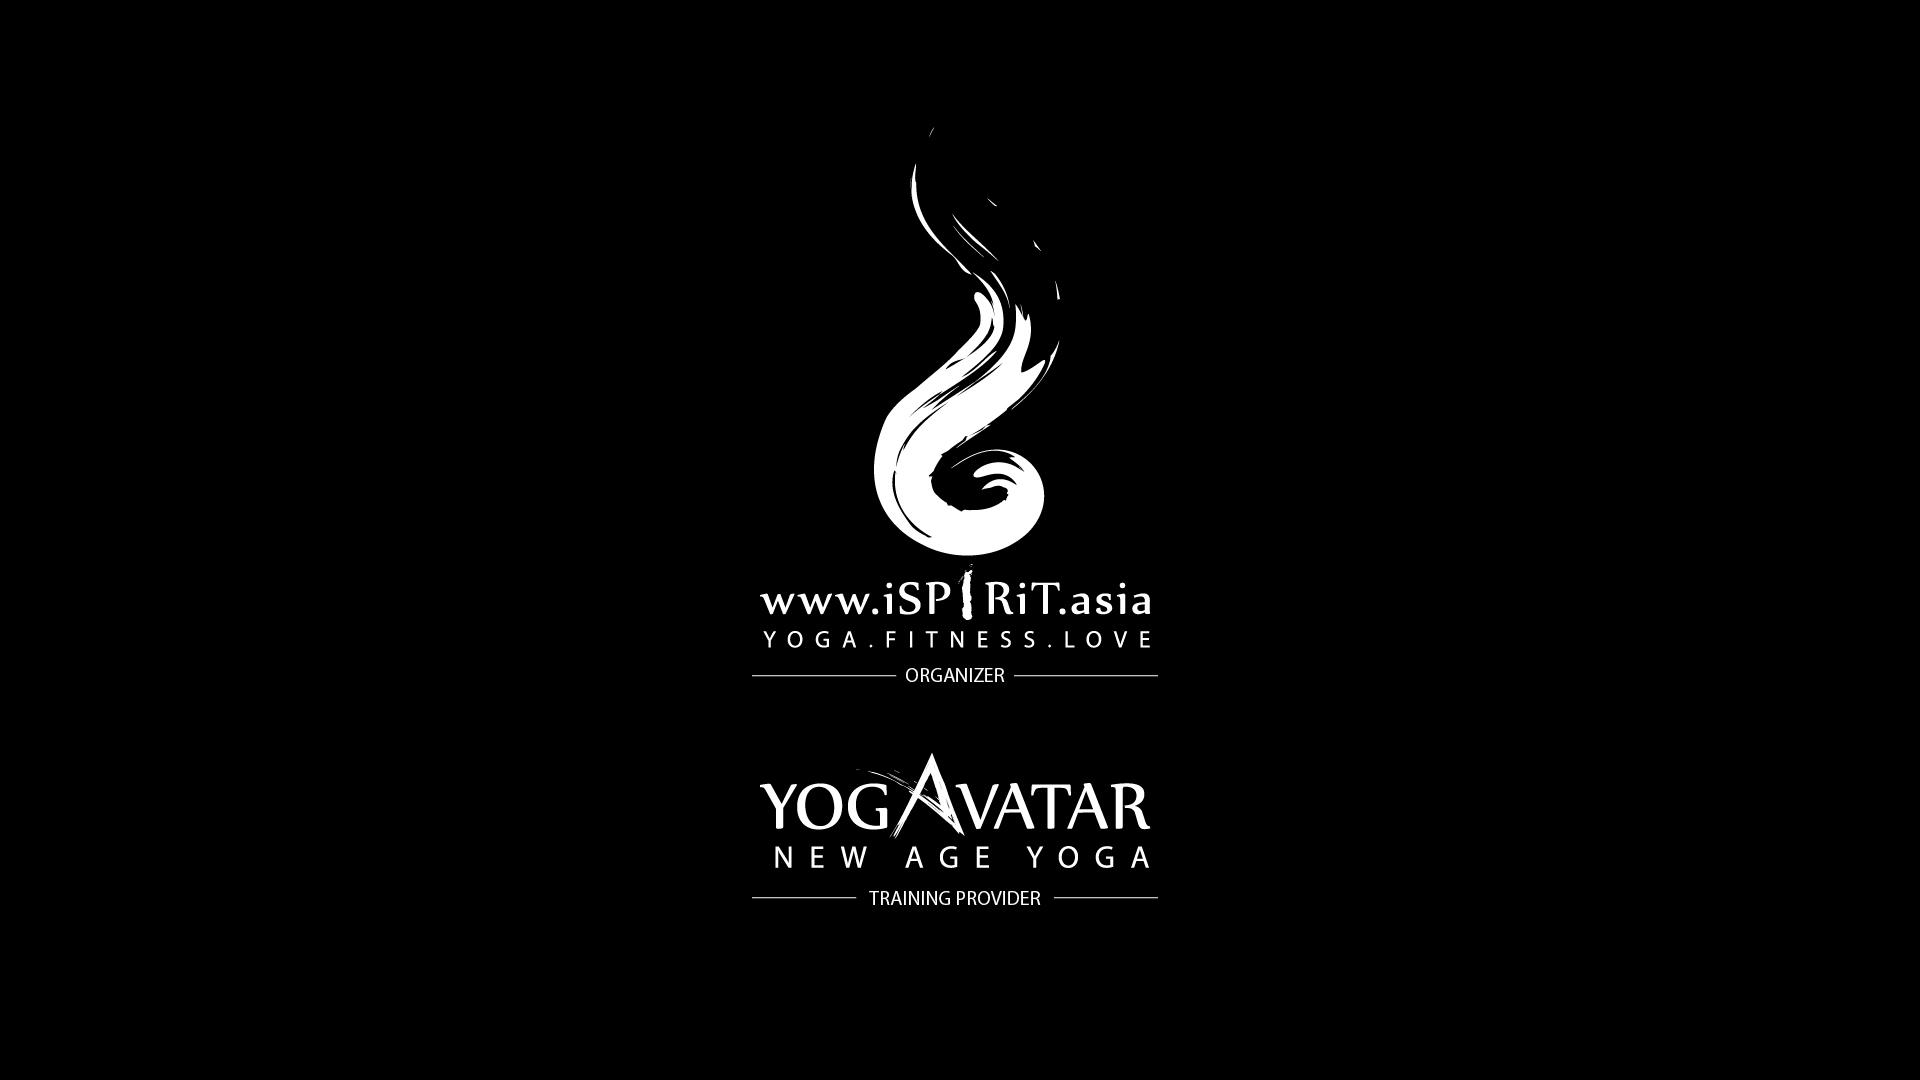 ISPIRIT ASIA & YOGAVATAR NEW AGE YOGA LOGO